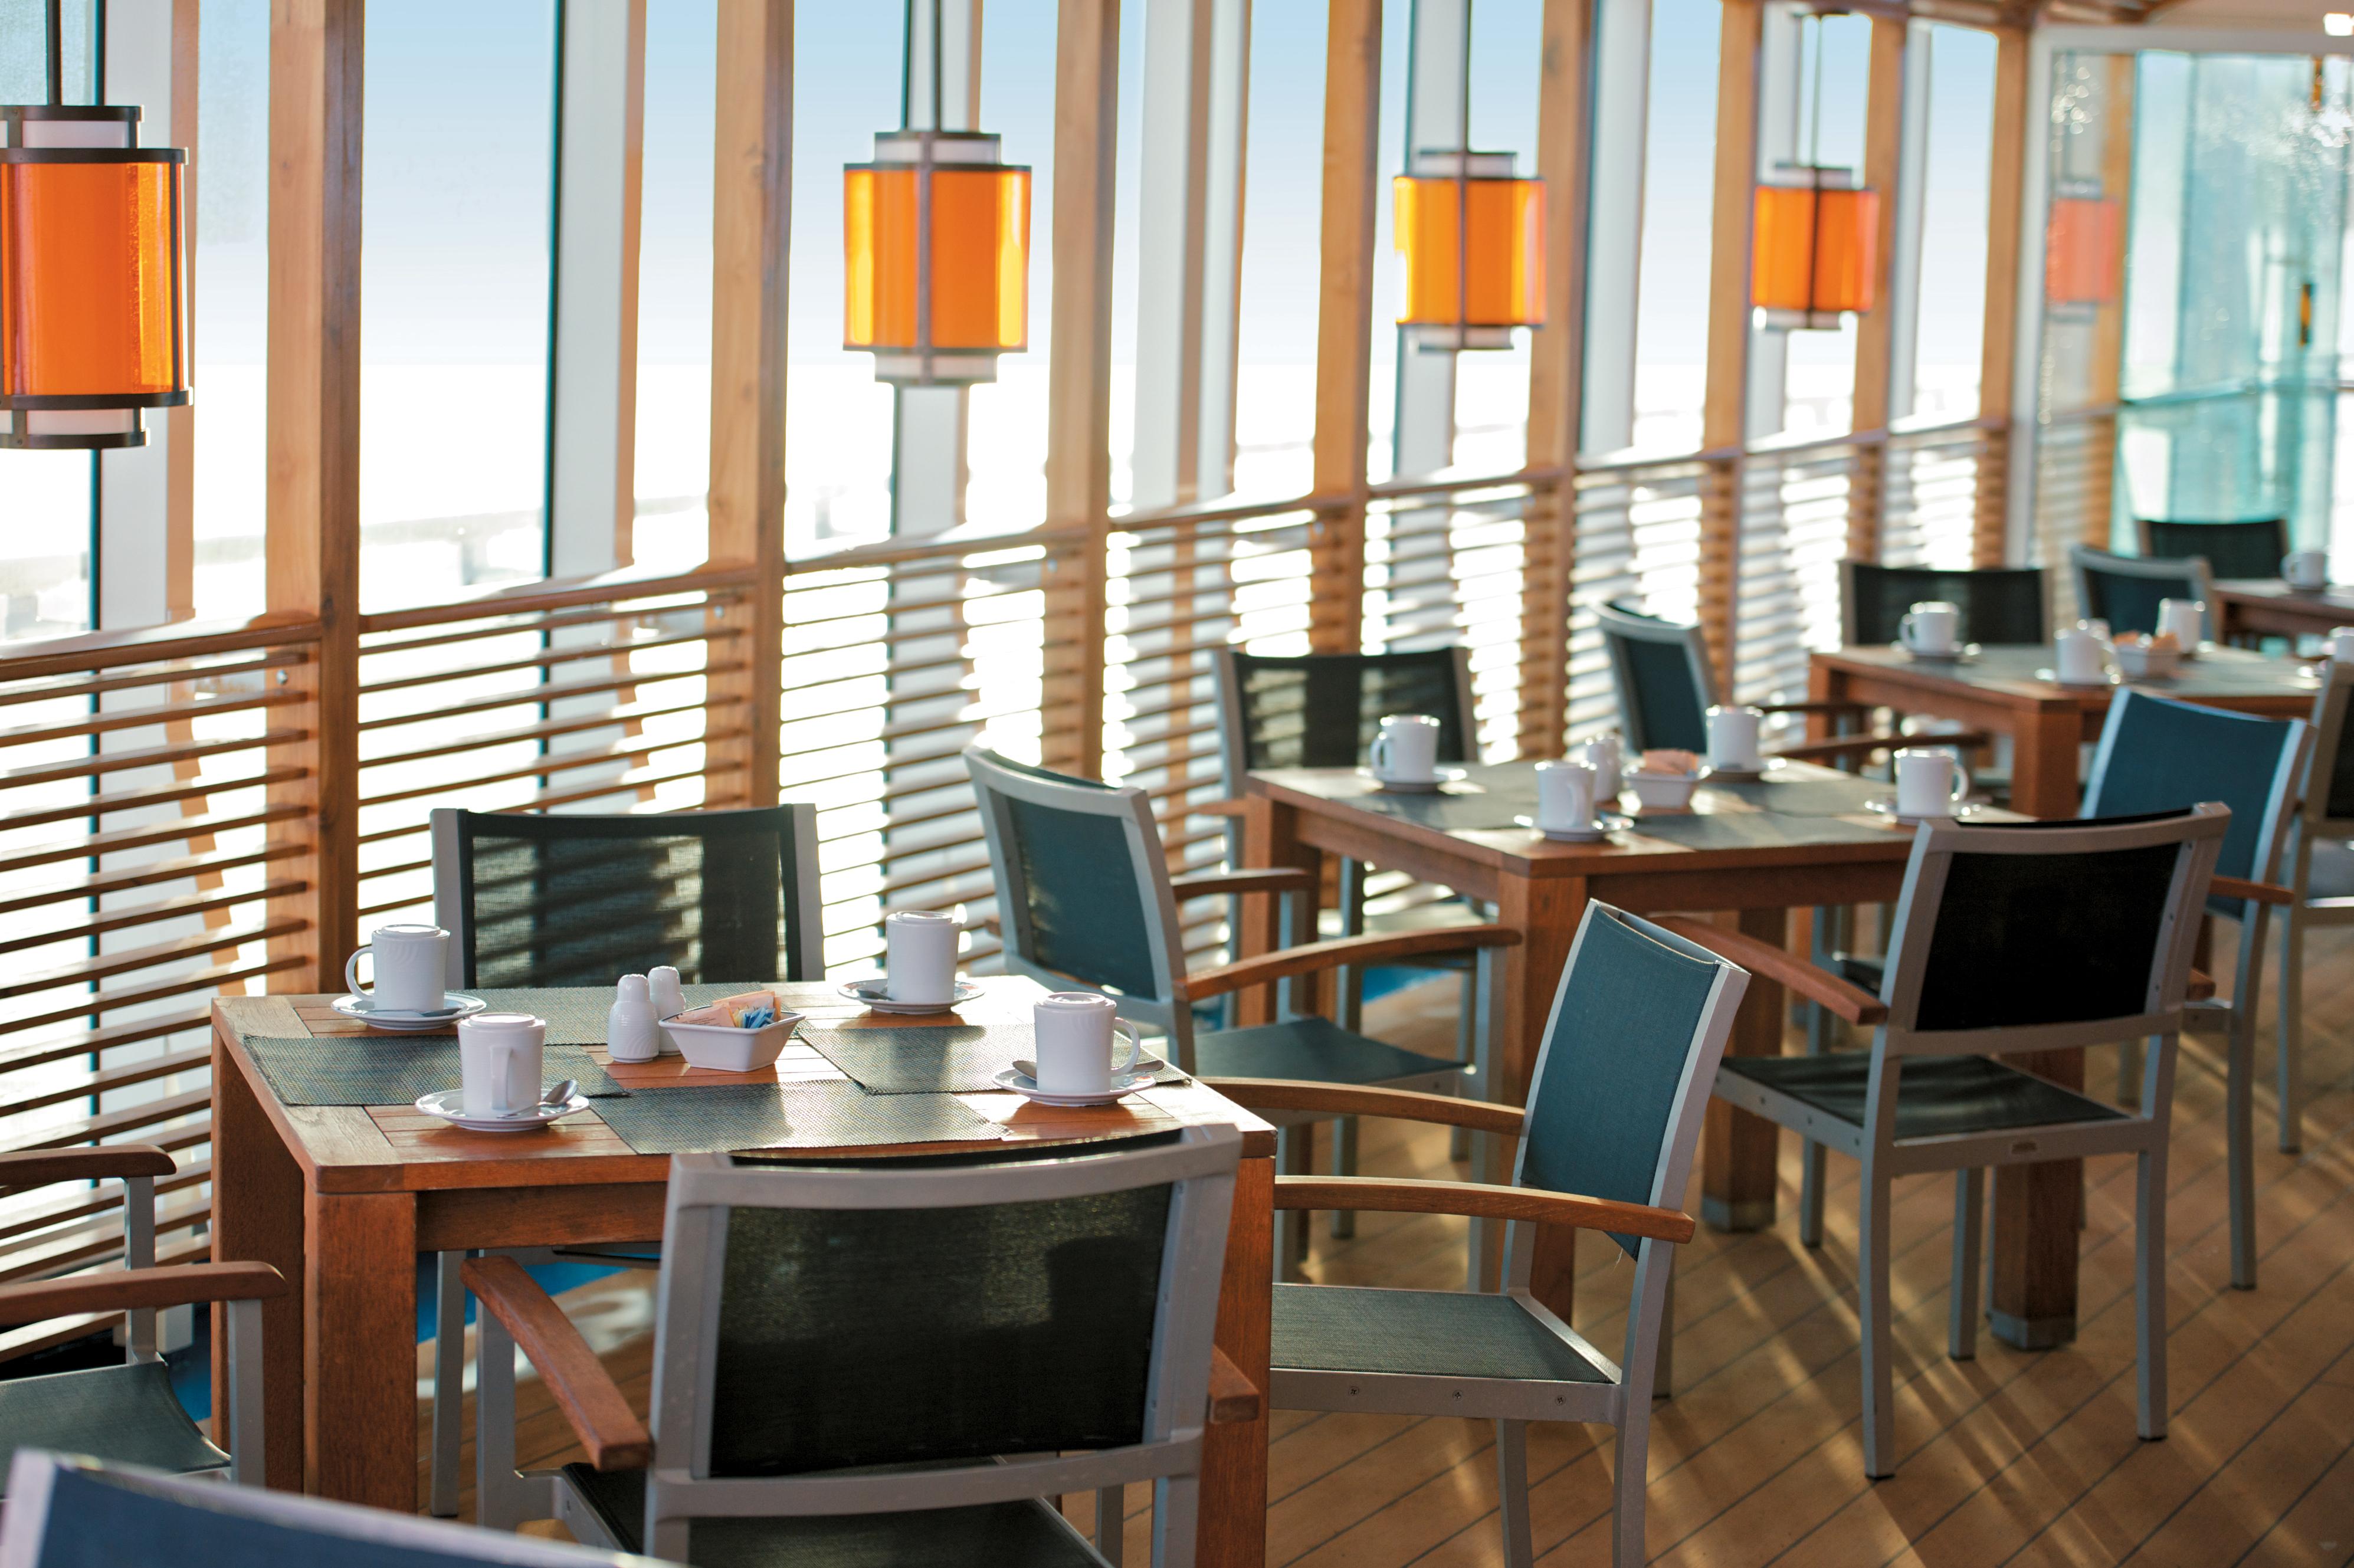 MS Paul Gauguin - Le Grill restaurant